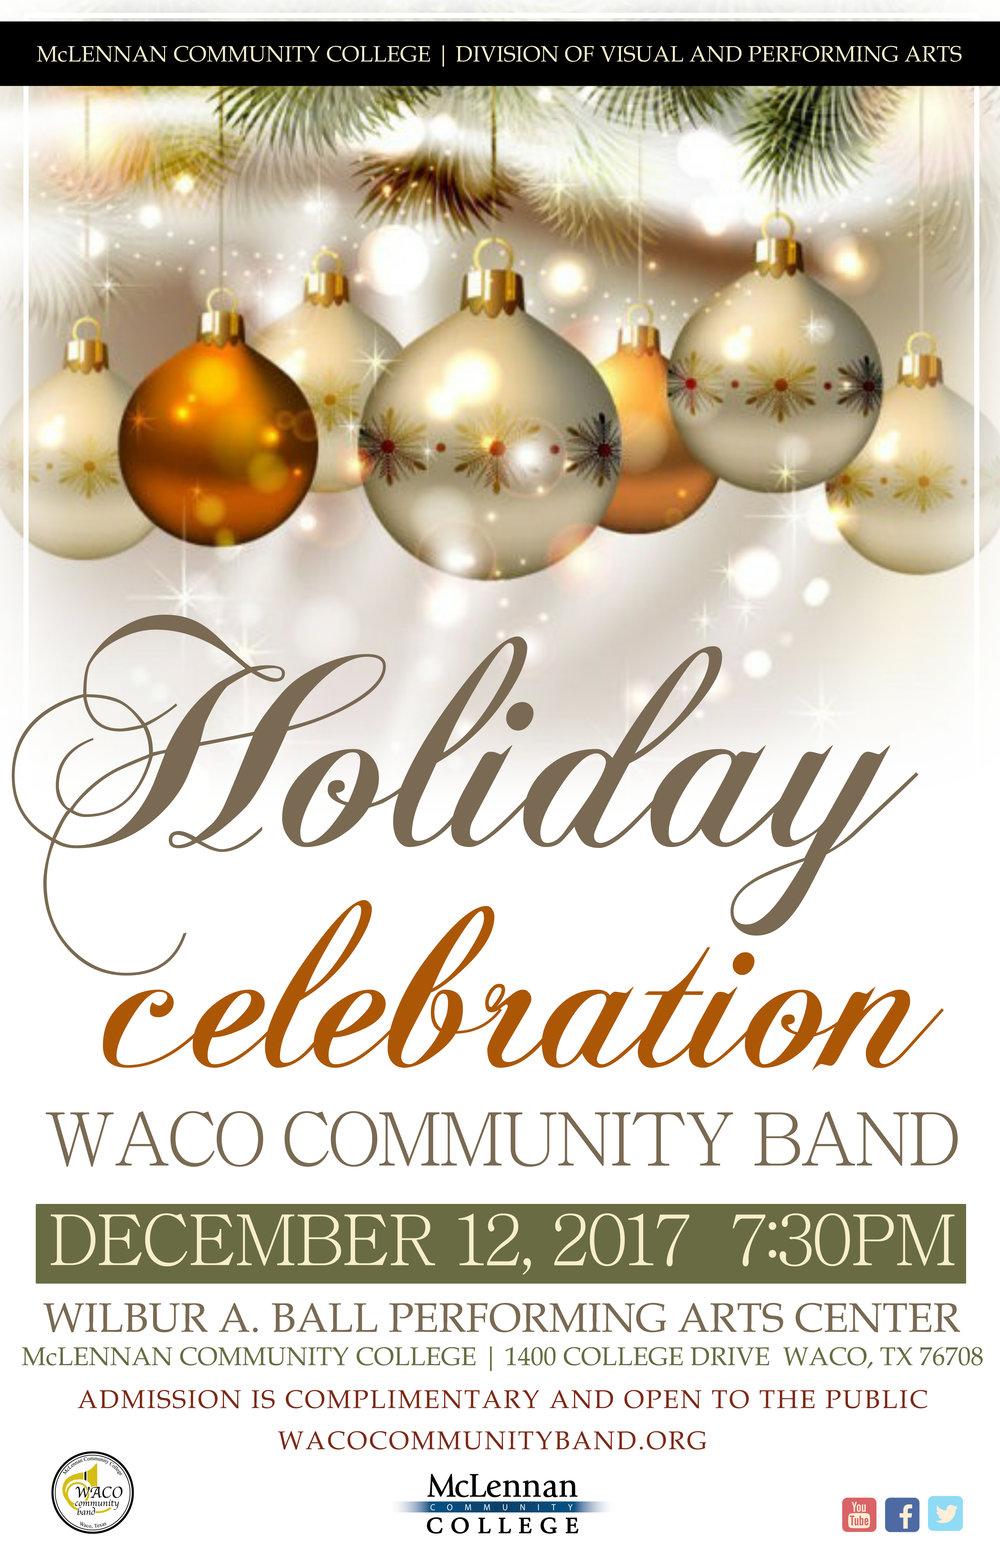 WCB_Dec_12_17_Holiday_Celebration.jpg